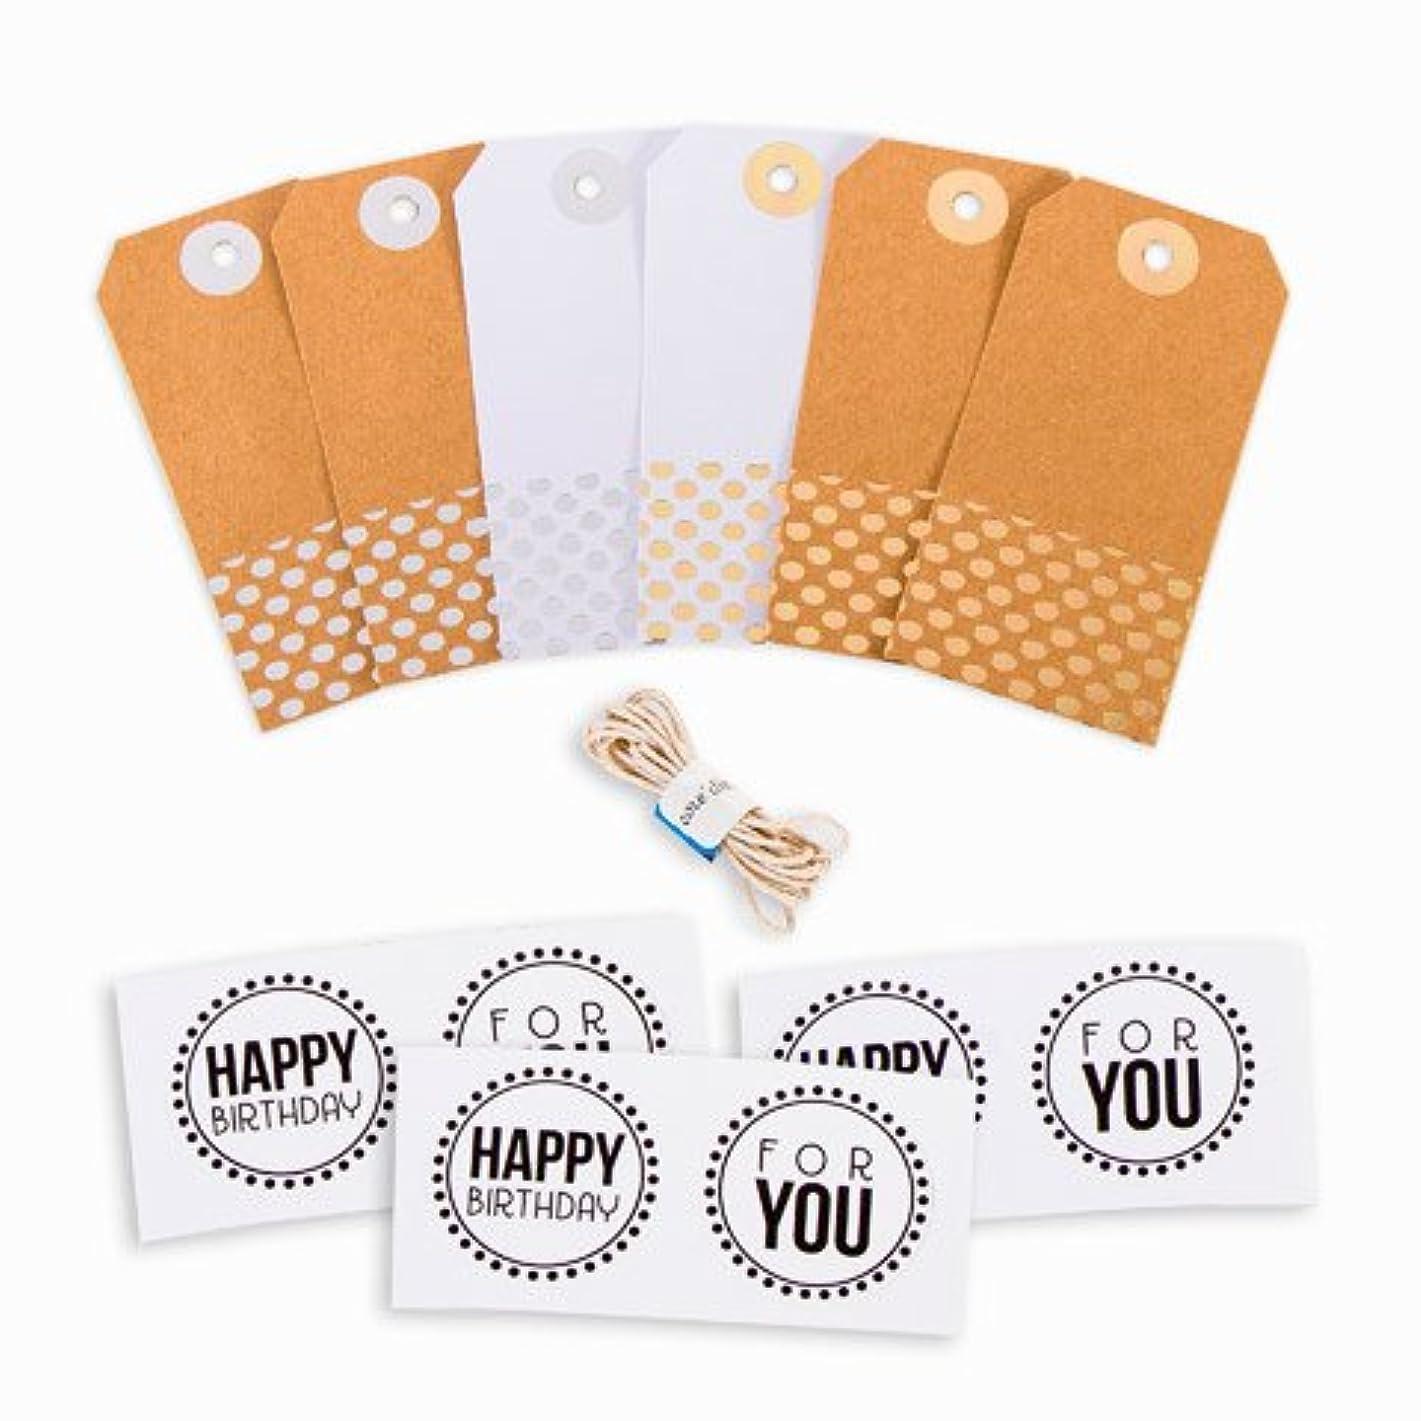 Darice Paper Gift Tags Kit, Metallic Gold & Silver Foil